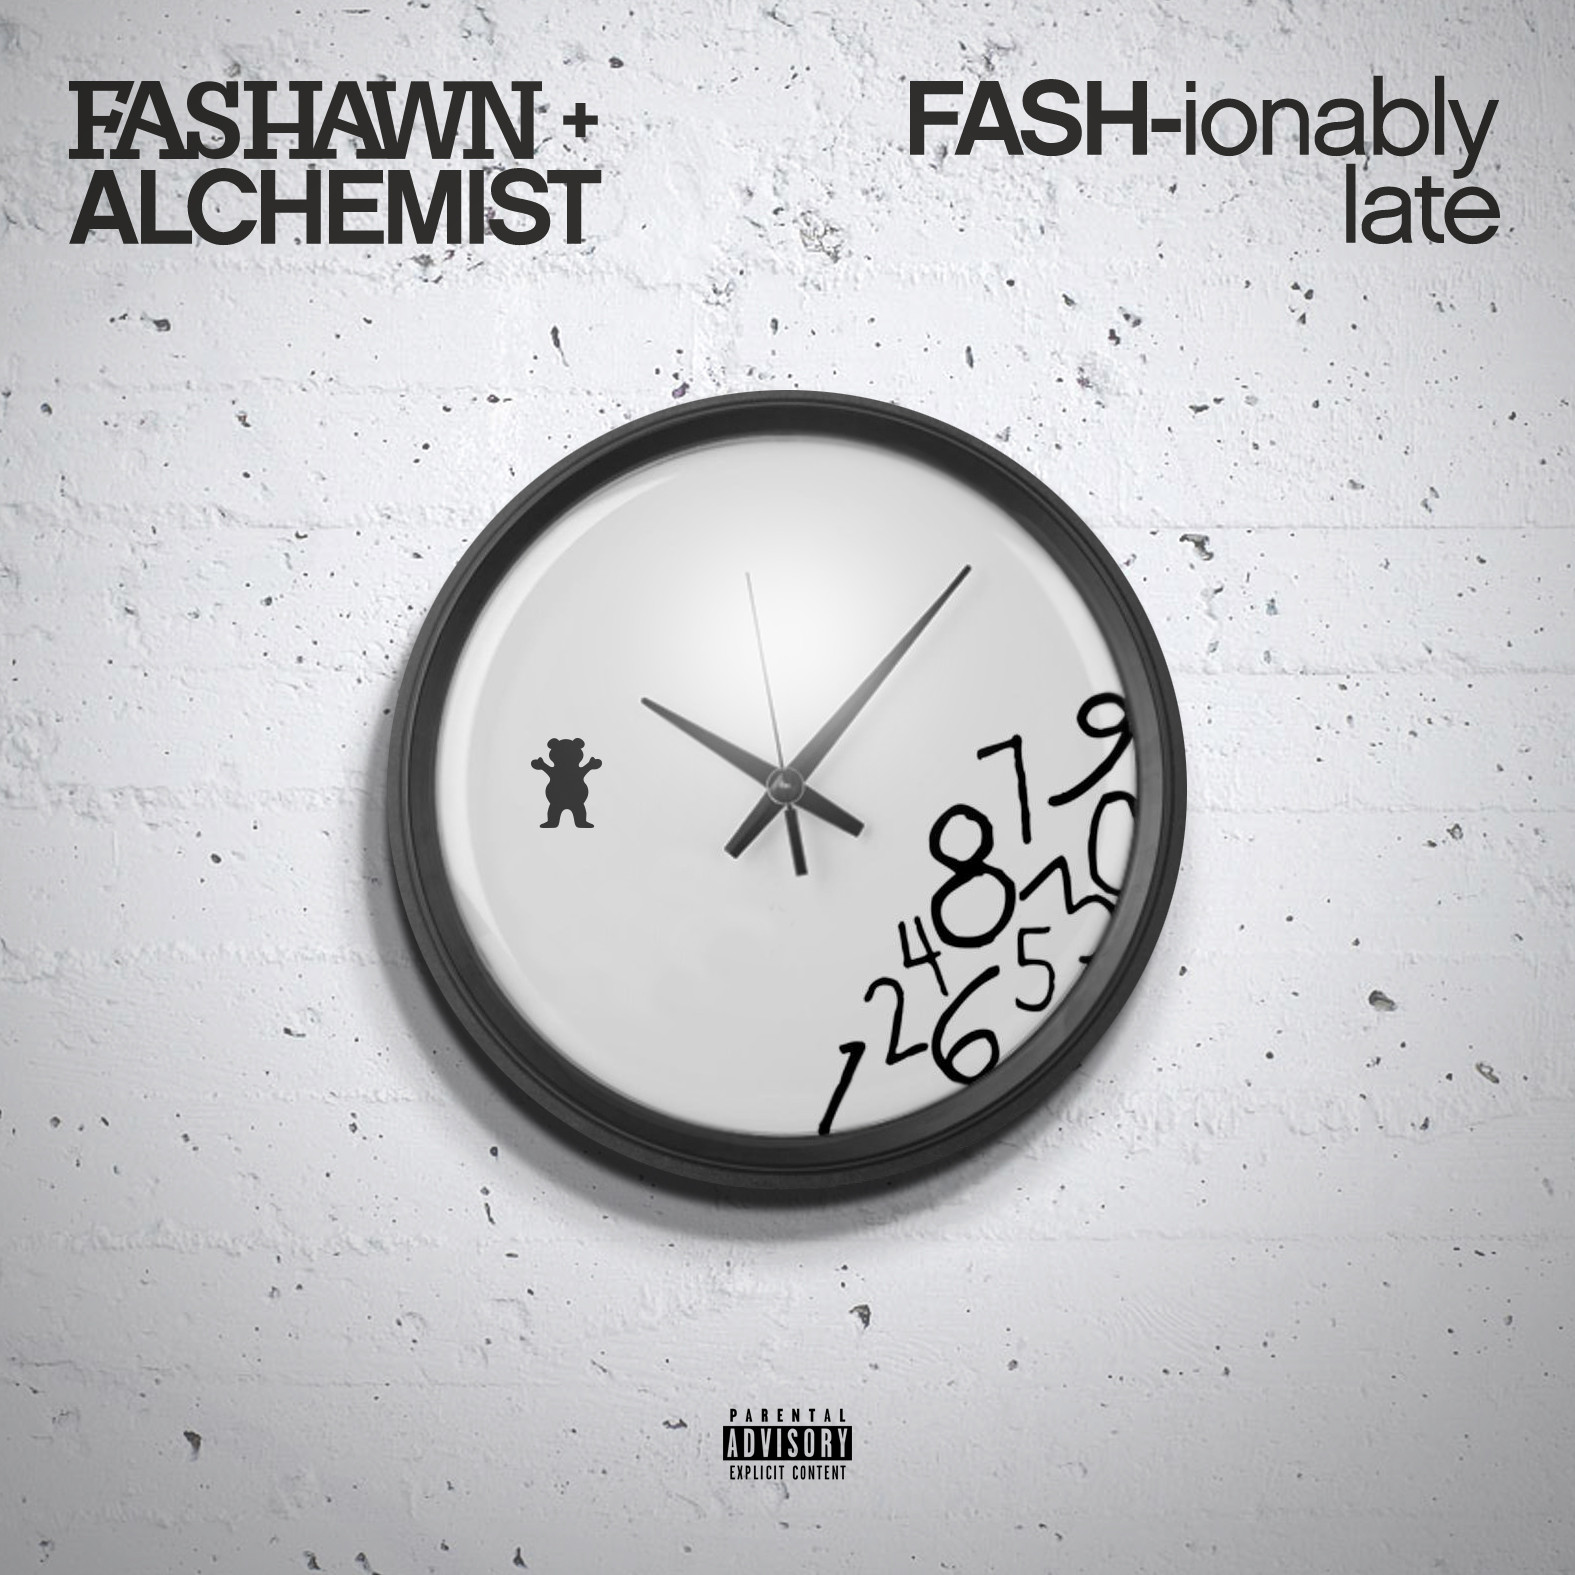 fashawn-fashionable-late